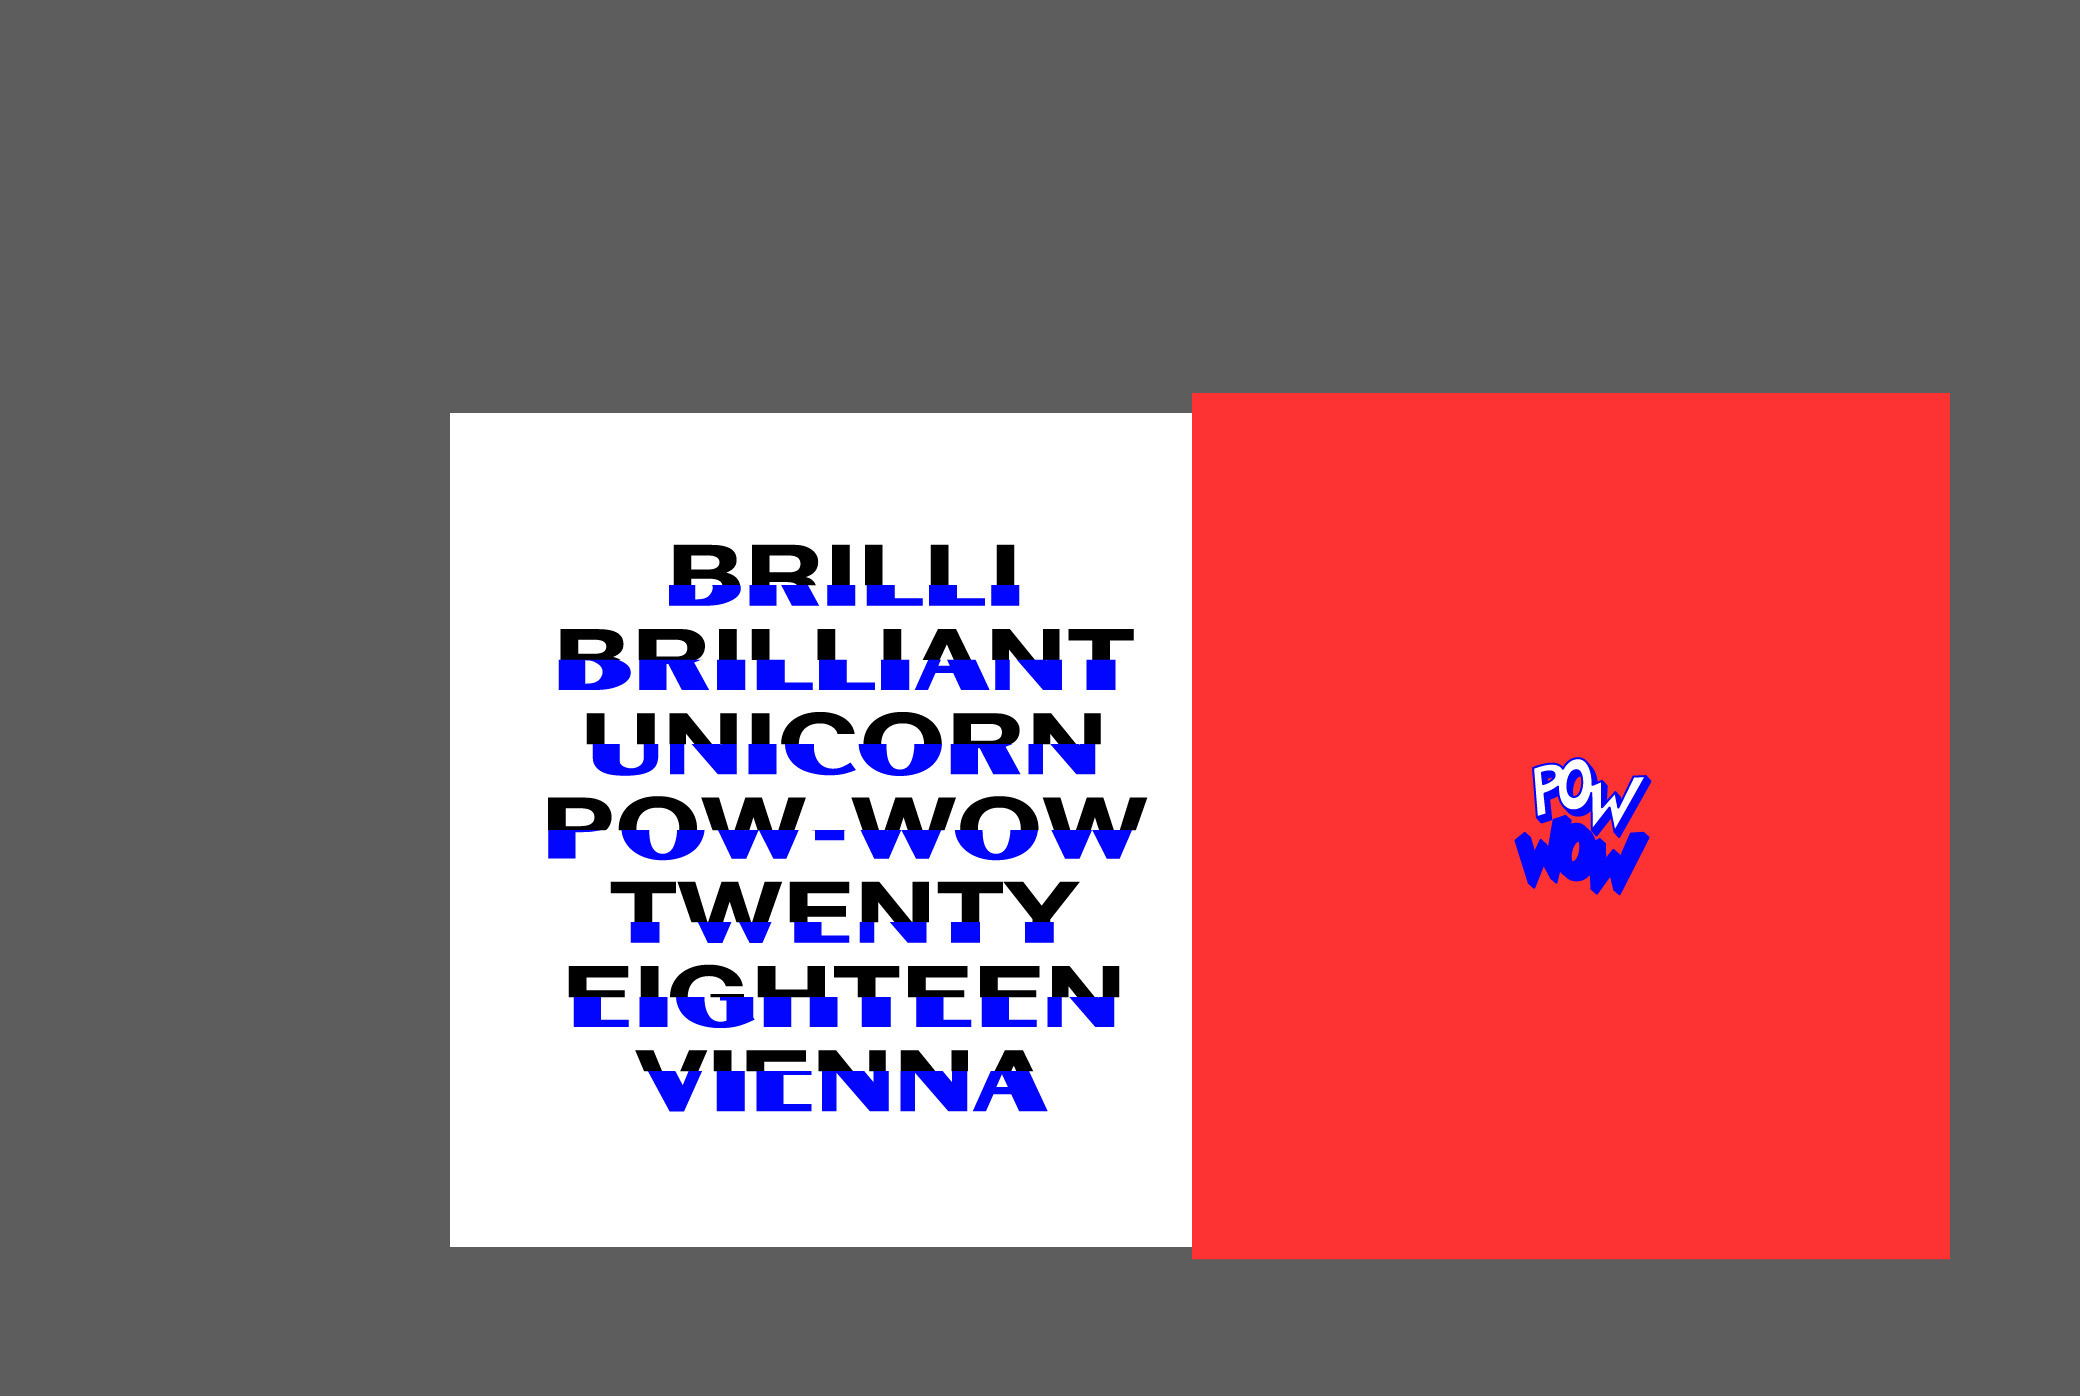 bbuc, powwow, vienna, screenshot - thnwmd | ello